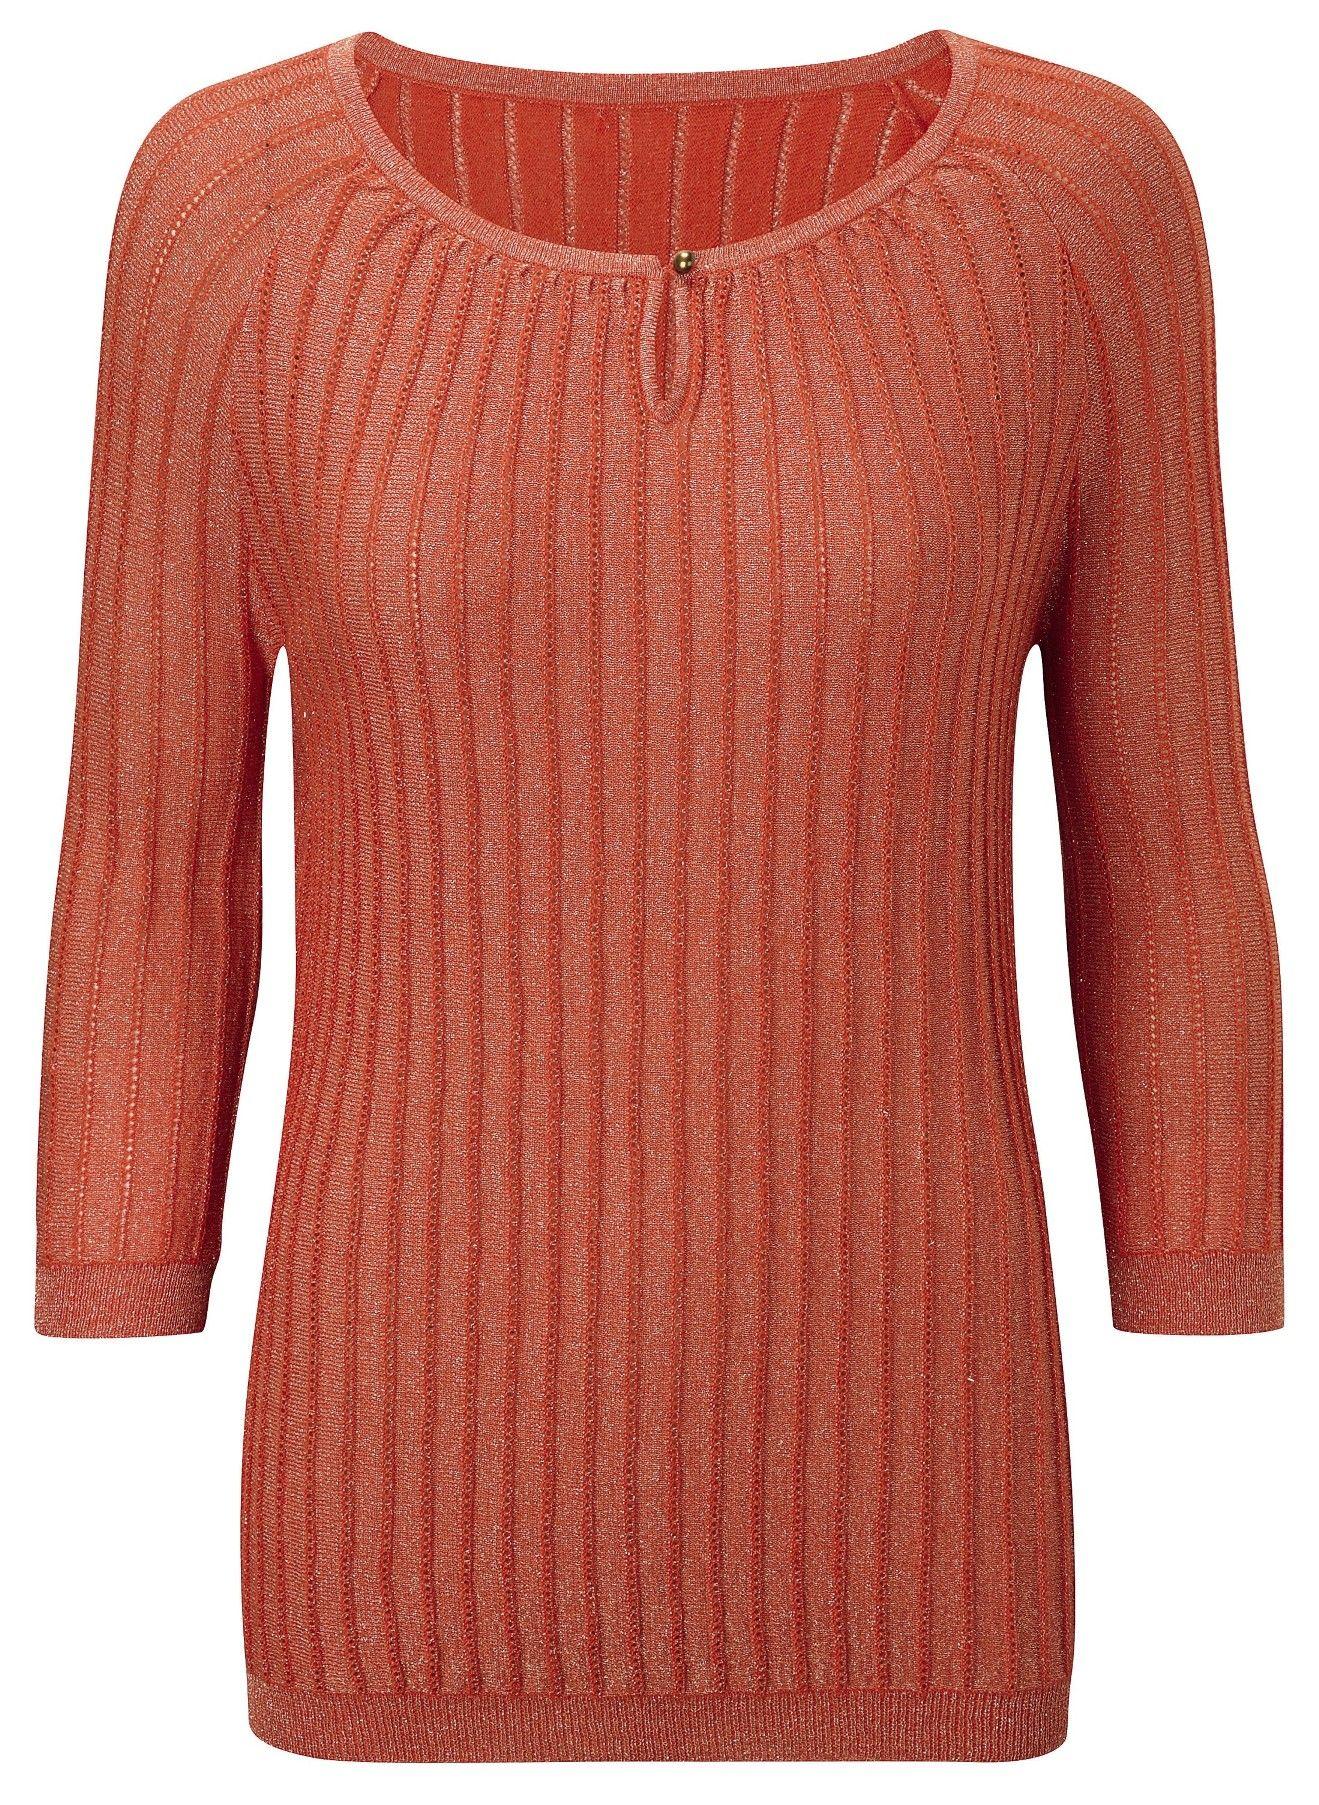 Damart burnt orange keyhole sweater, product code B446. www.damart ...